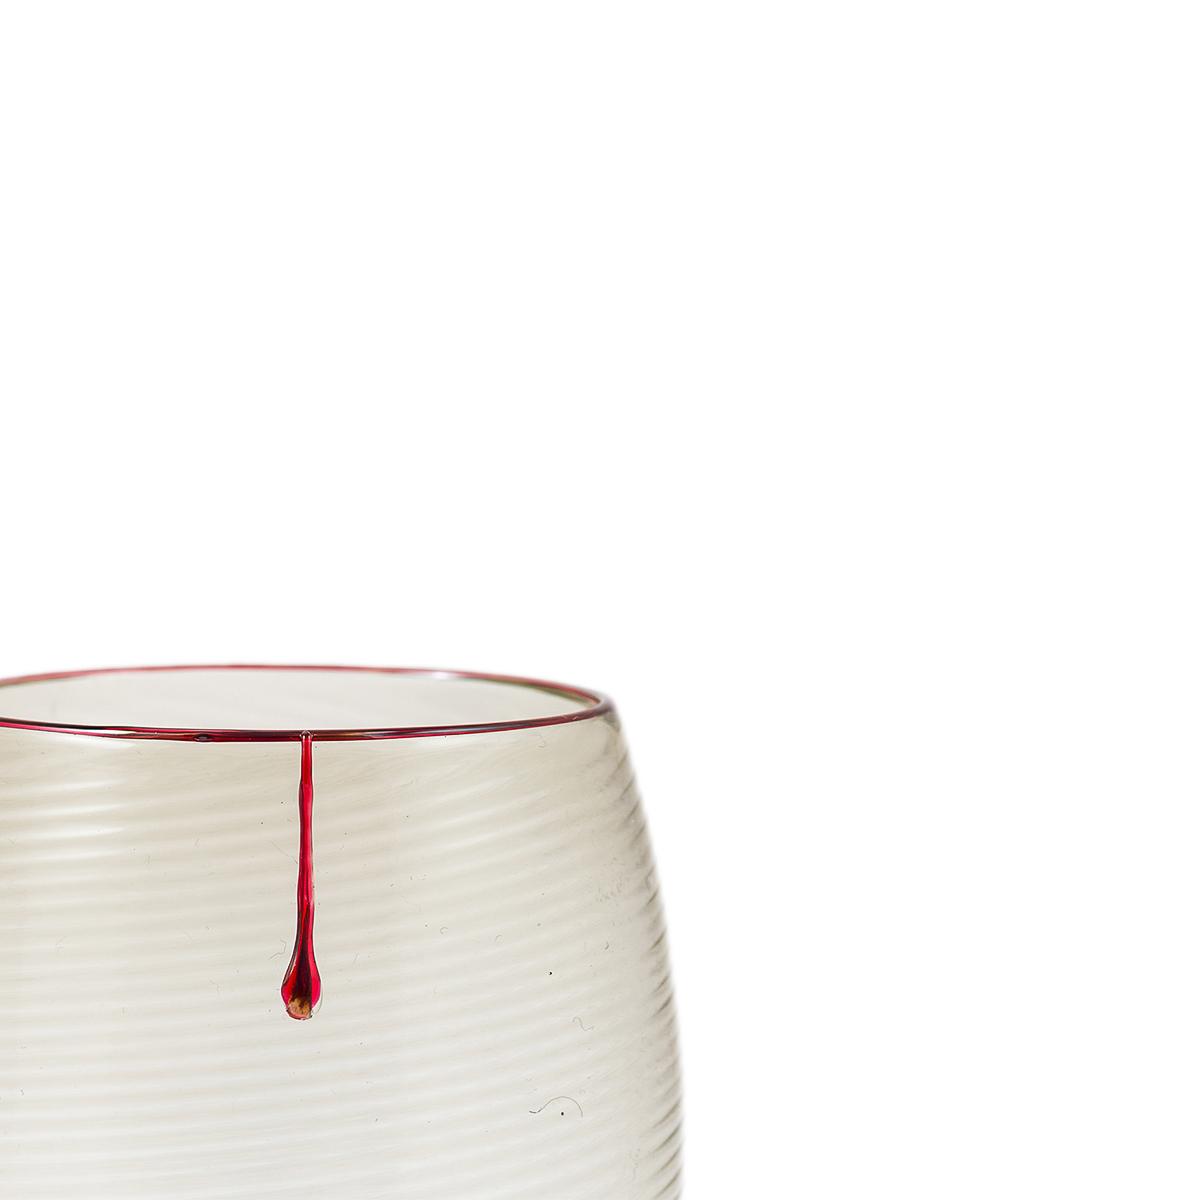 julia-ruby-wine-fume-grey-glass-detail-murano-design-luxury